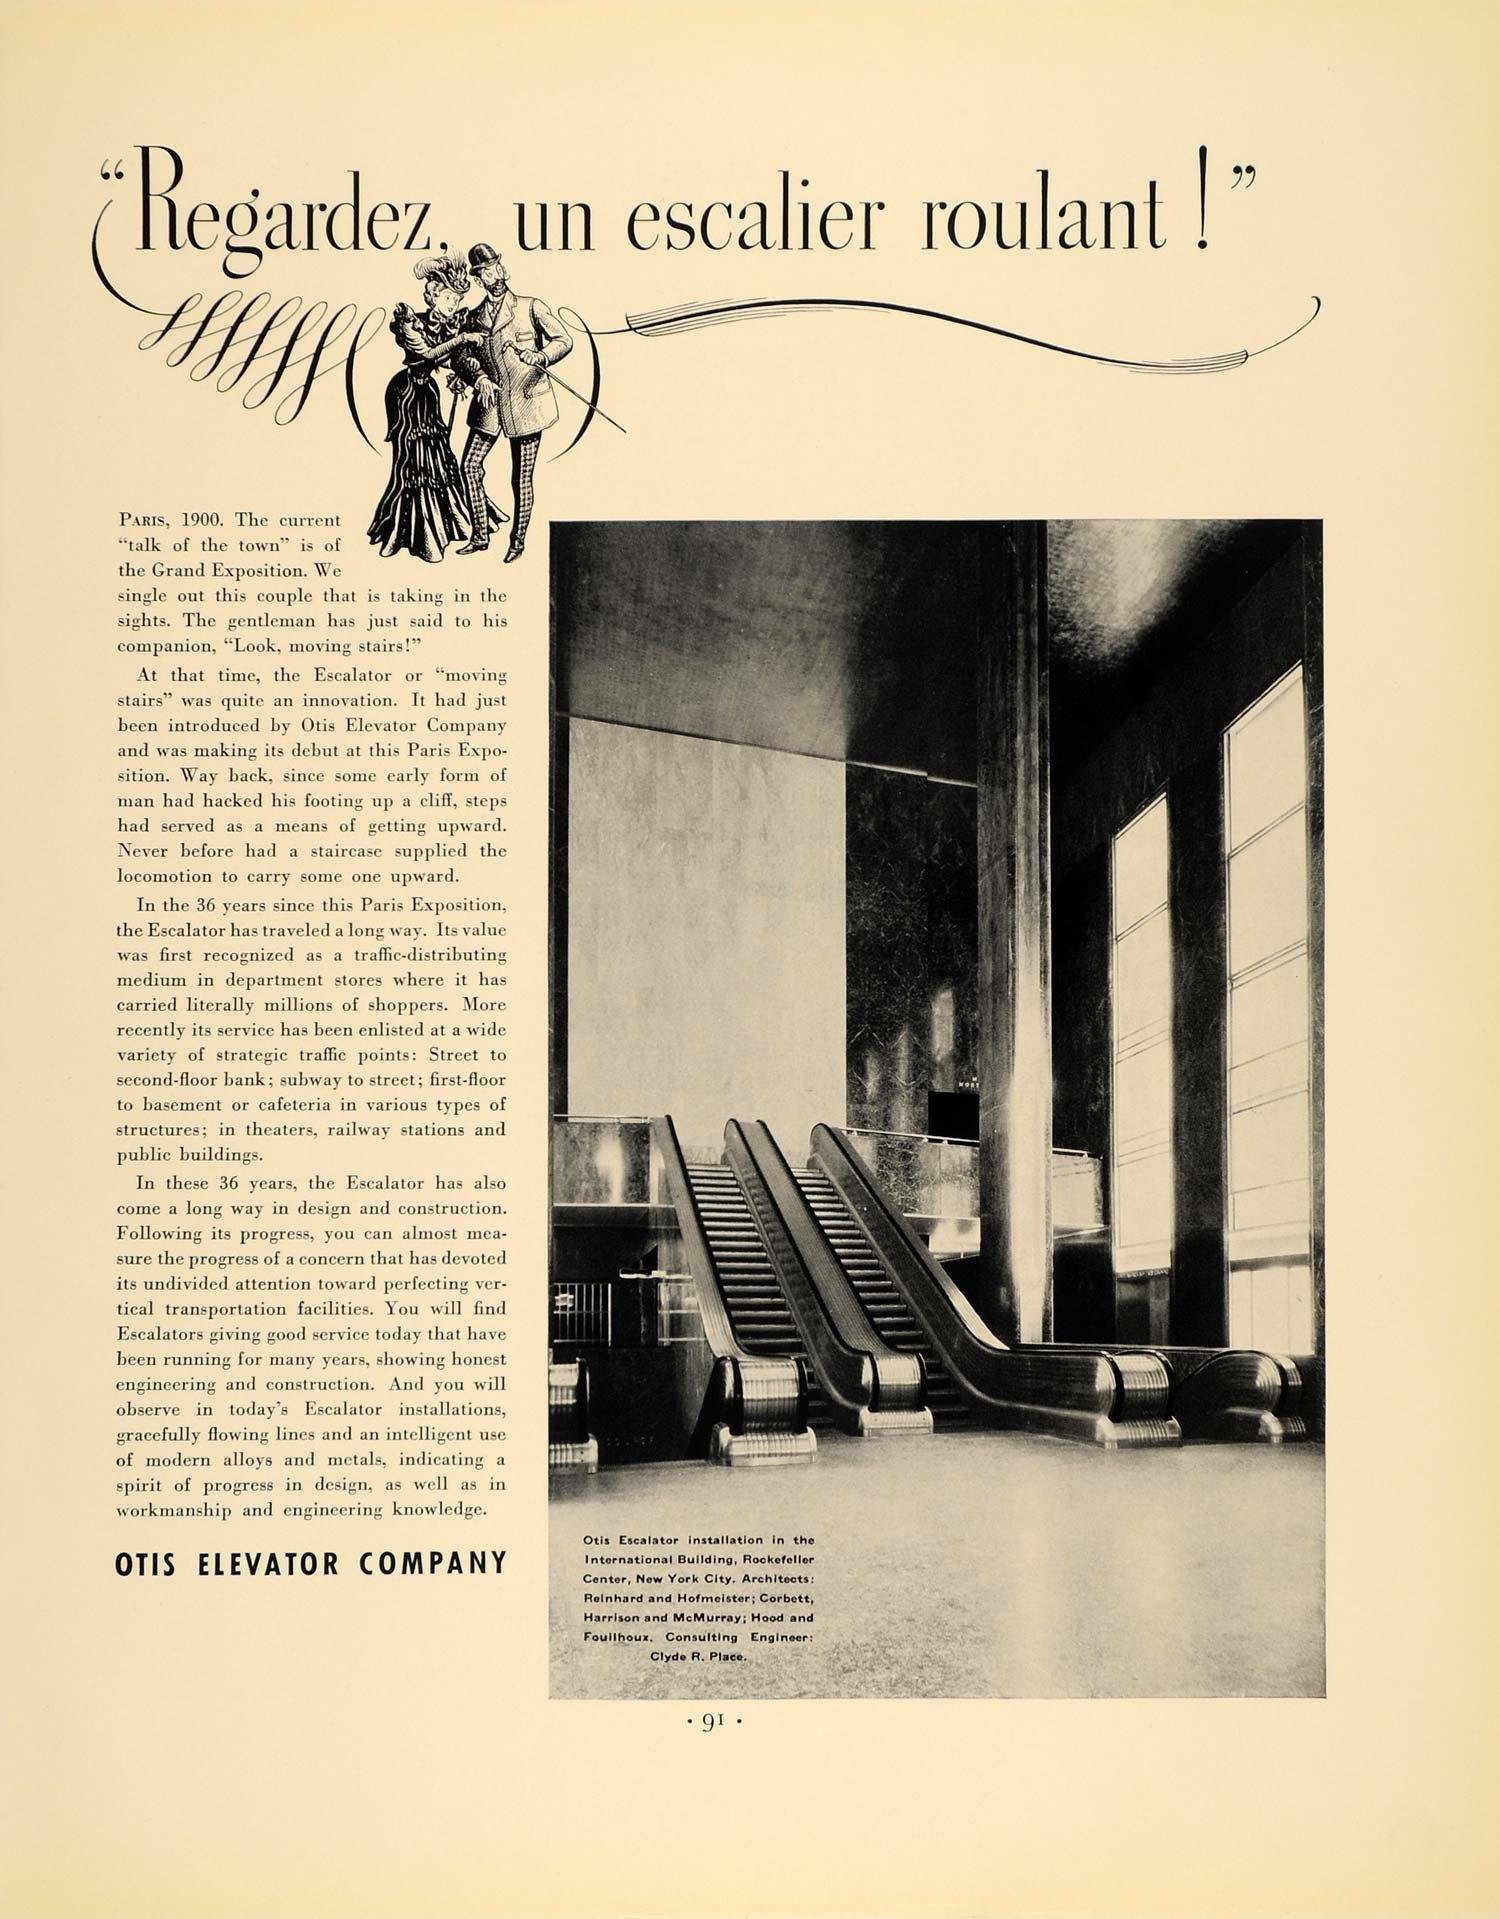 1936 Ad Otis Elevator Company Rockerfella International Building - ORIGINAL ADVERTISING F5A.jpg